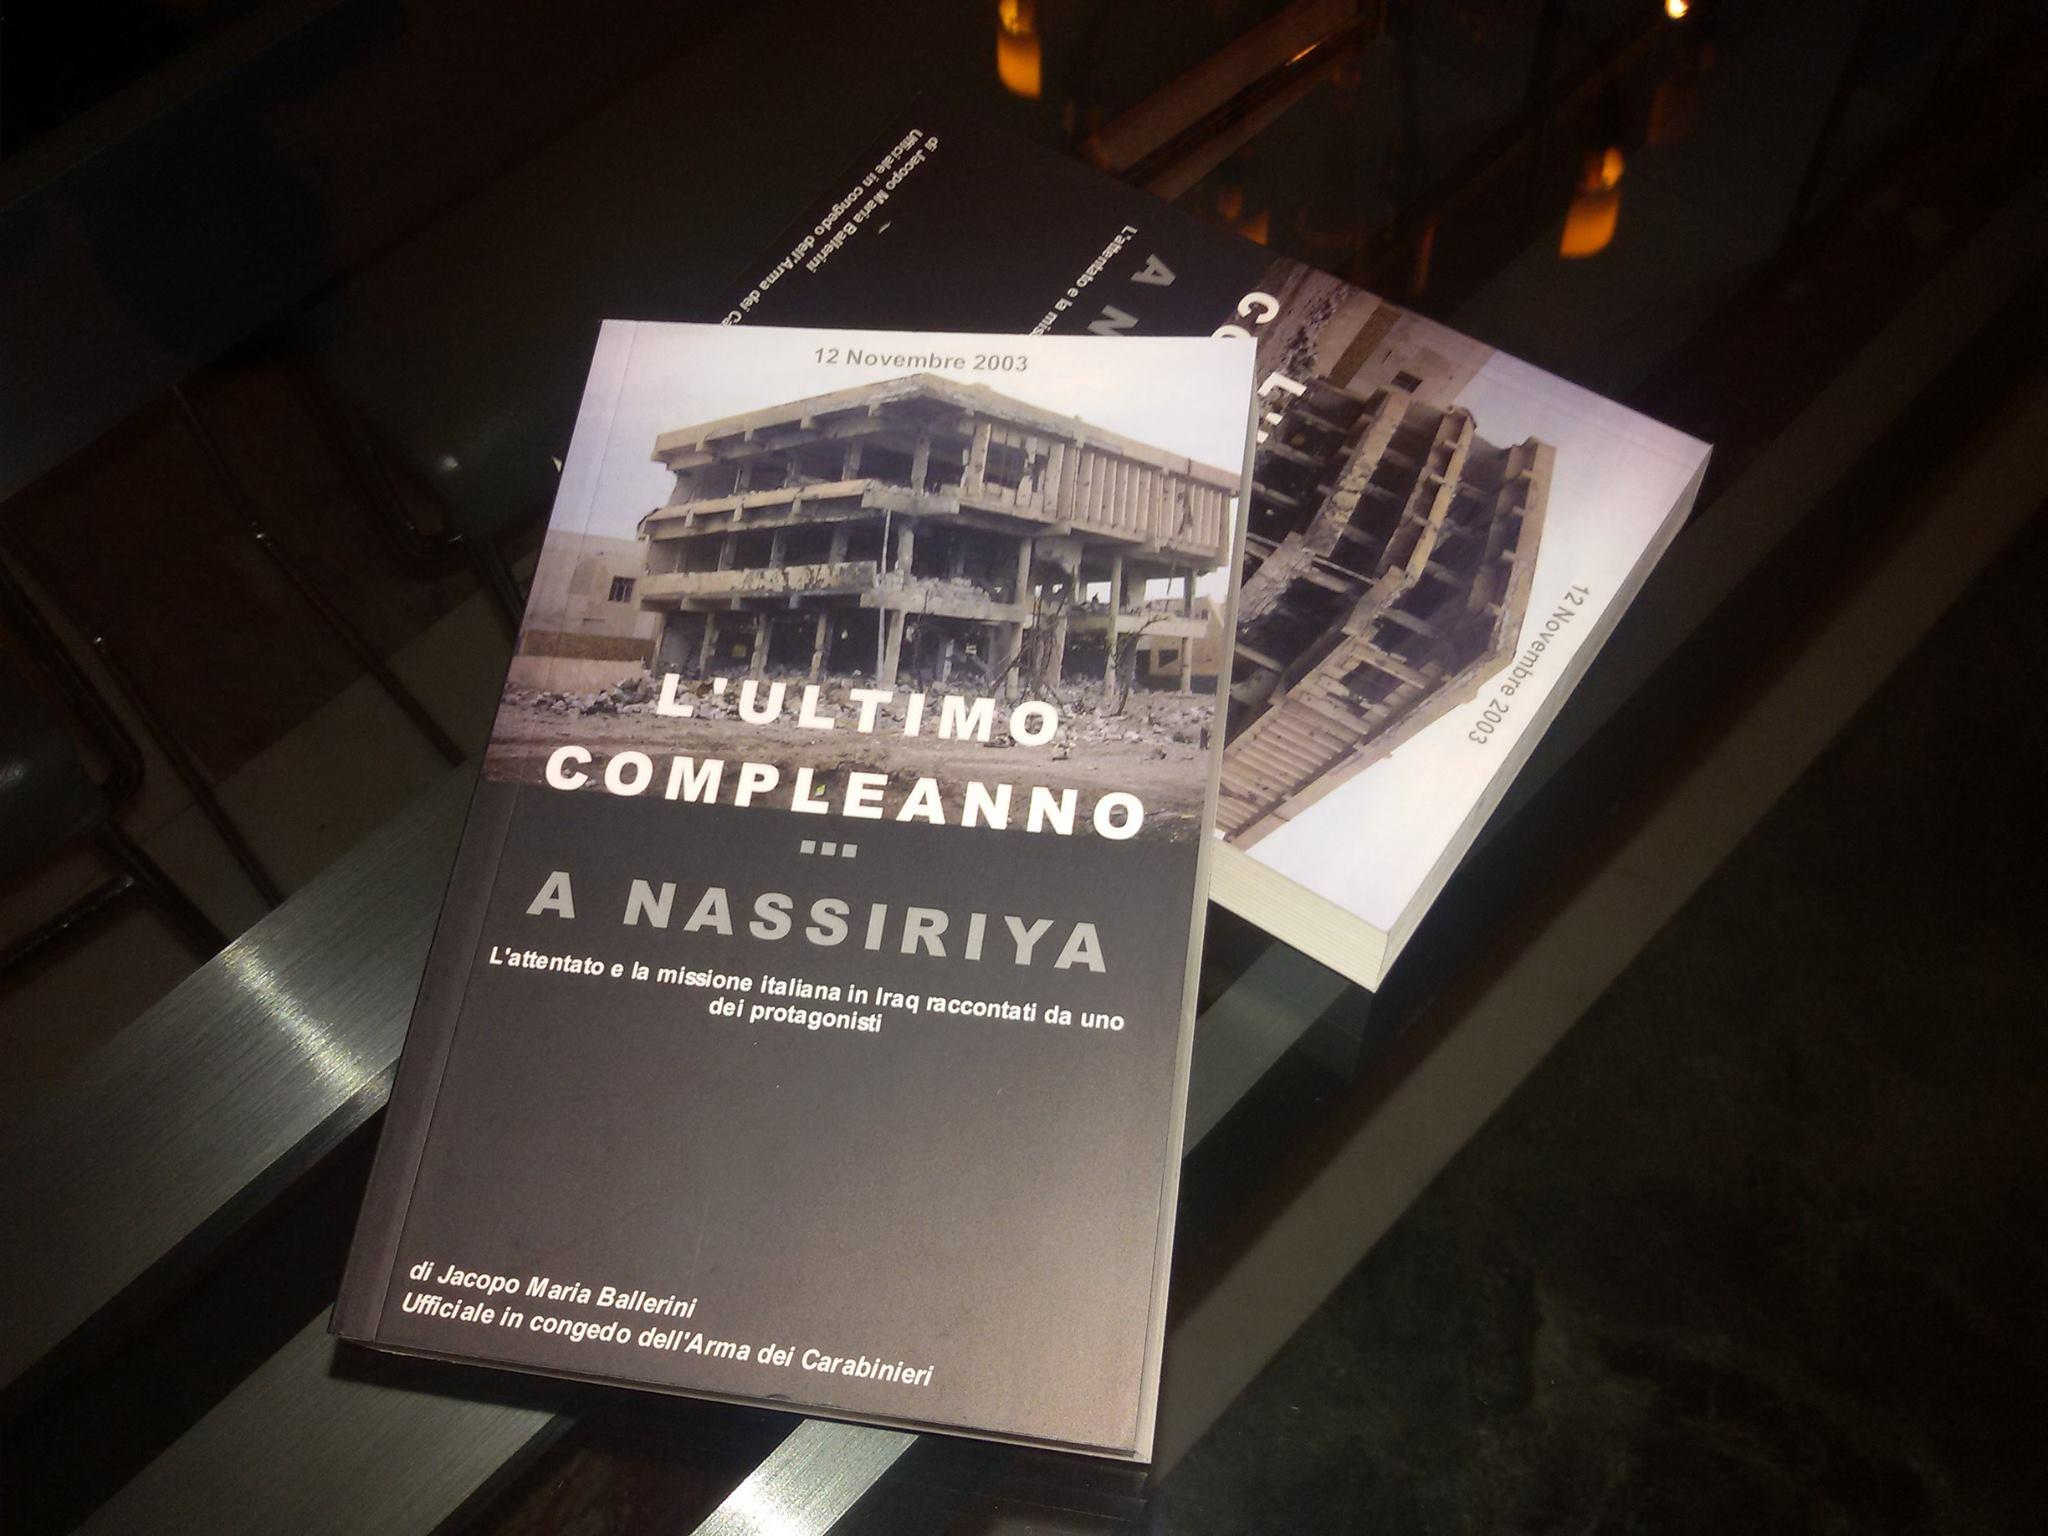 premio Nassirya2